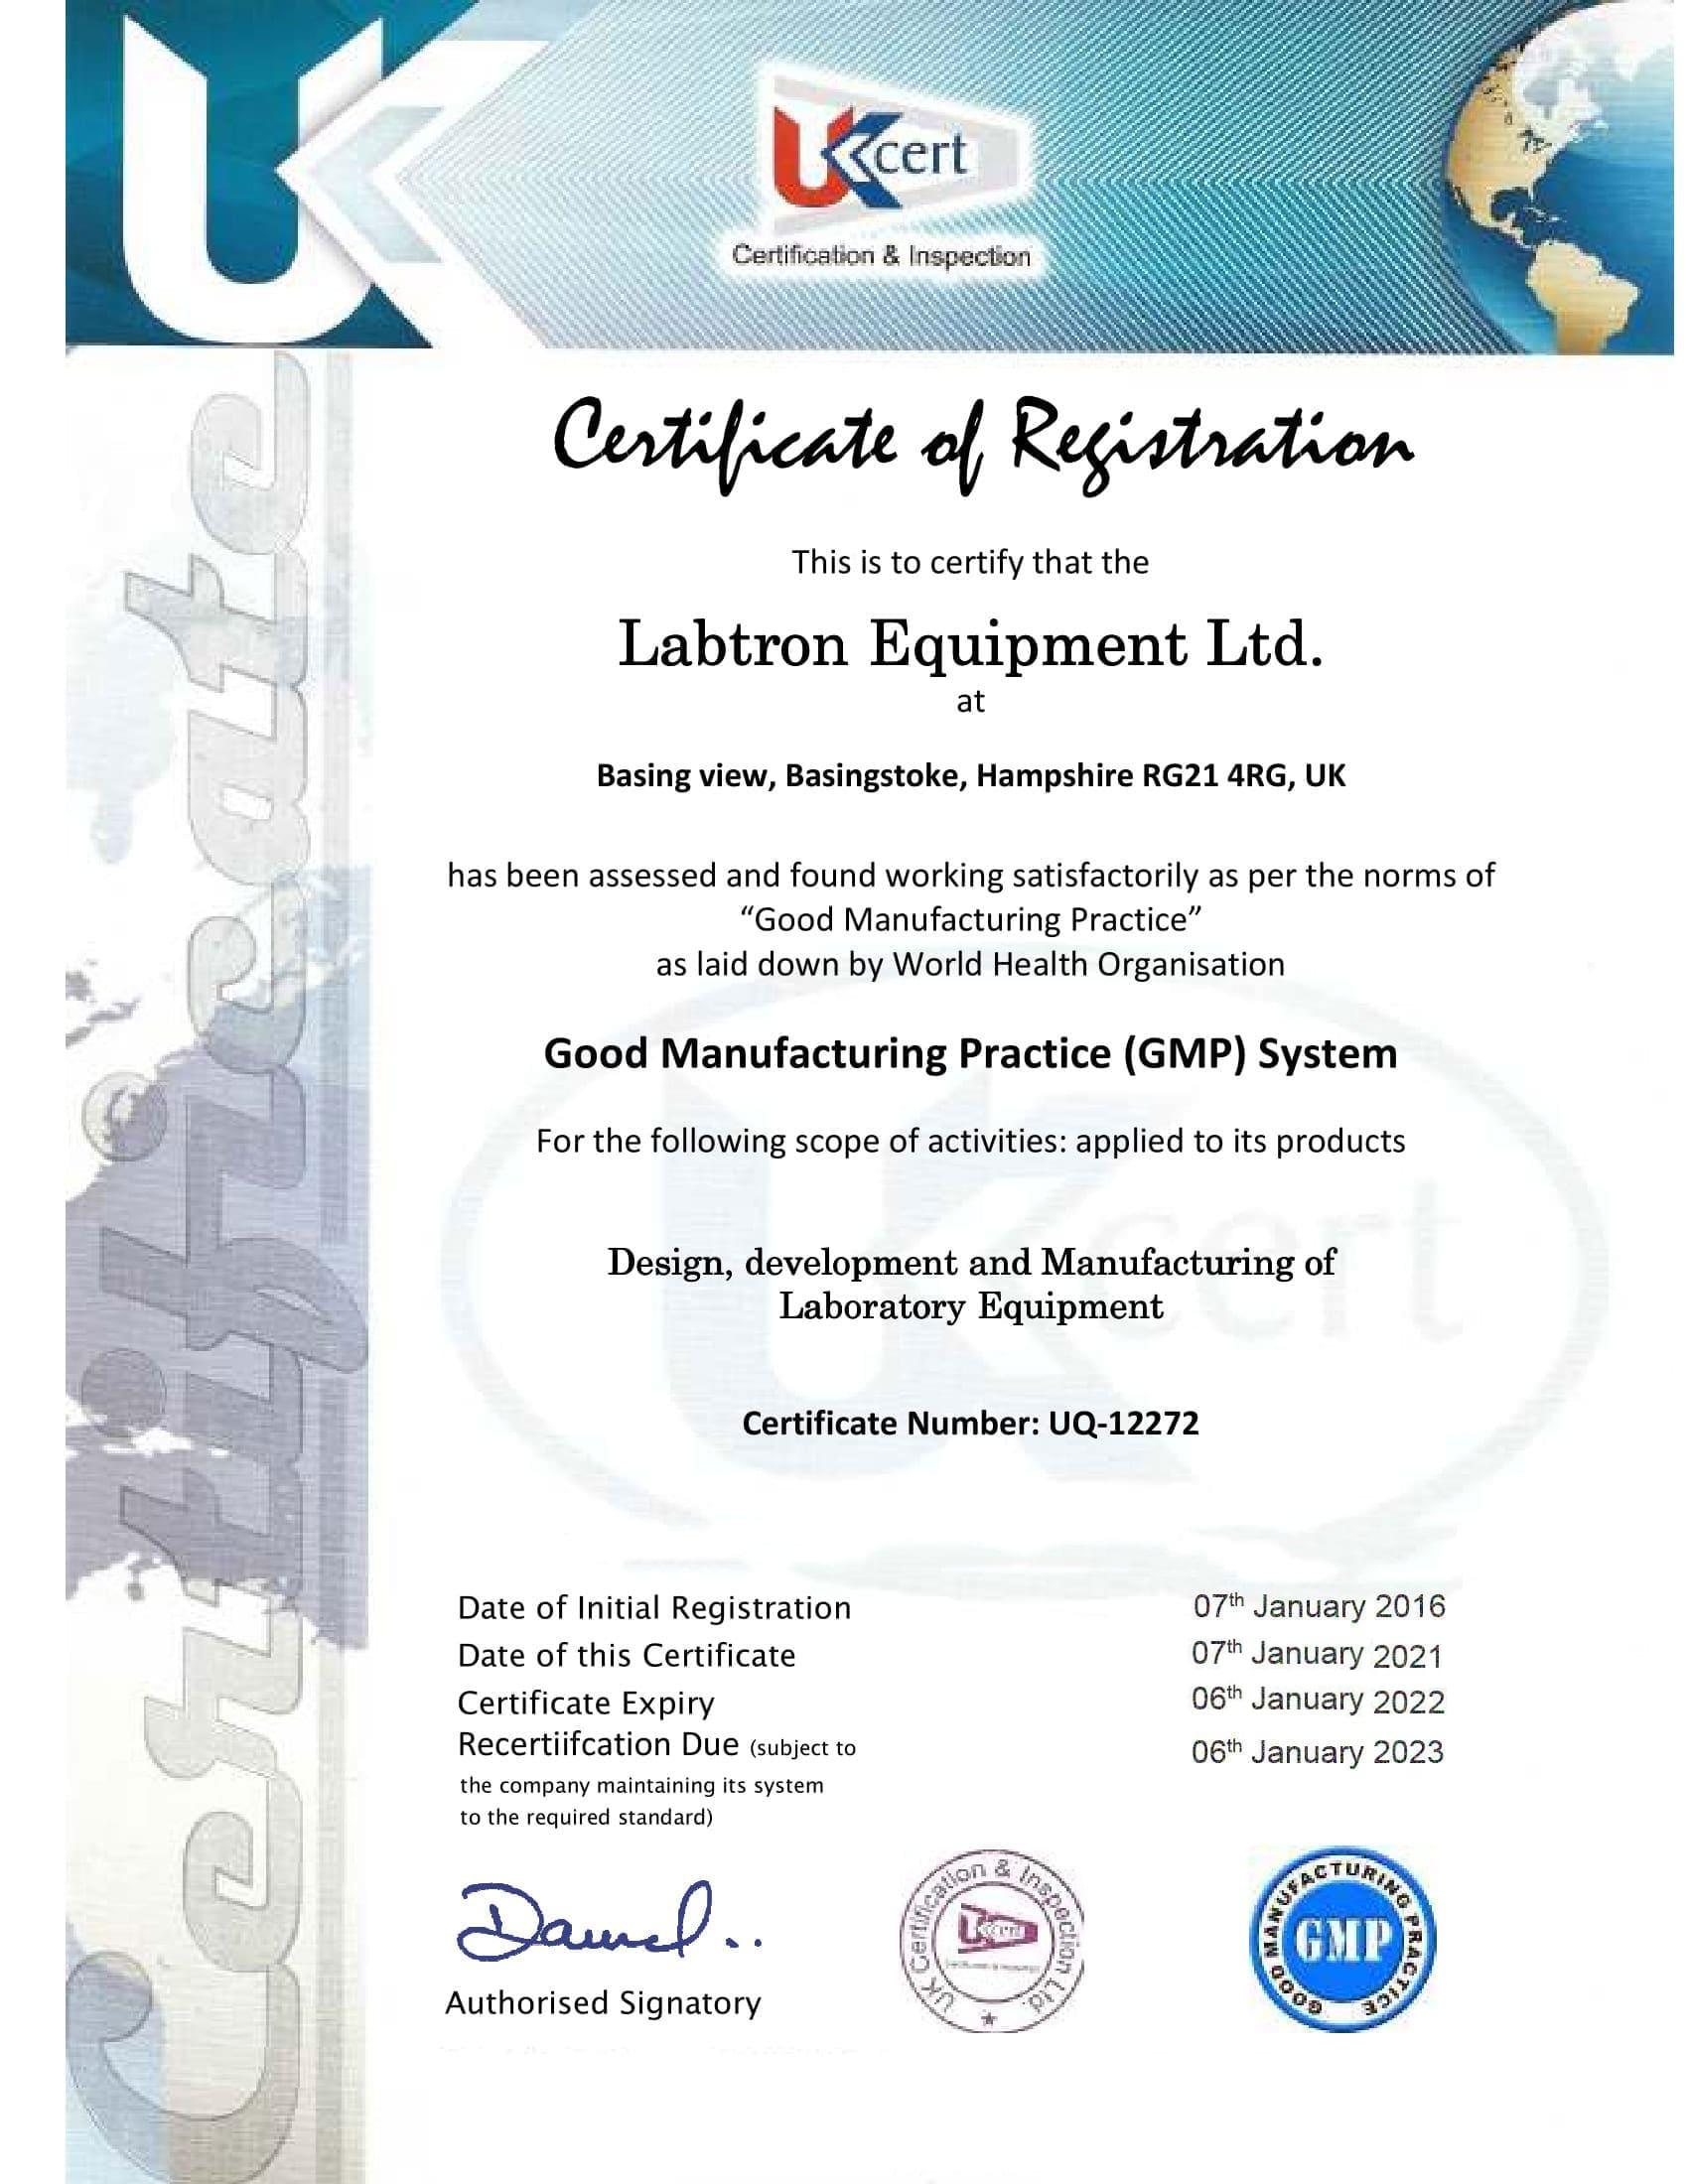 Labtron Equipment Ltd. GMP UQ-4600 UKCert : Labtron Certification